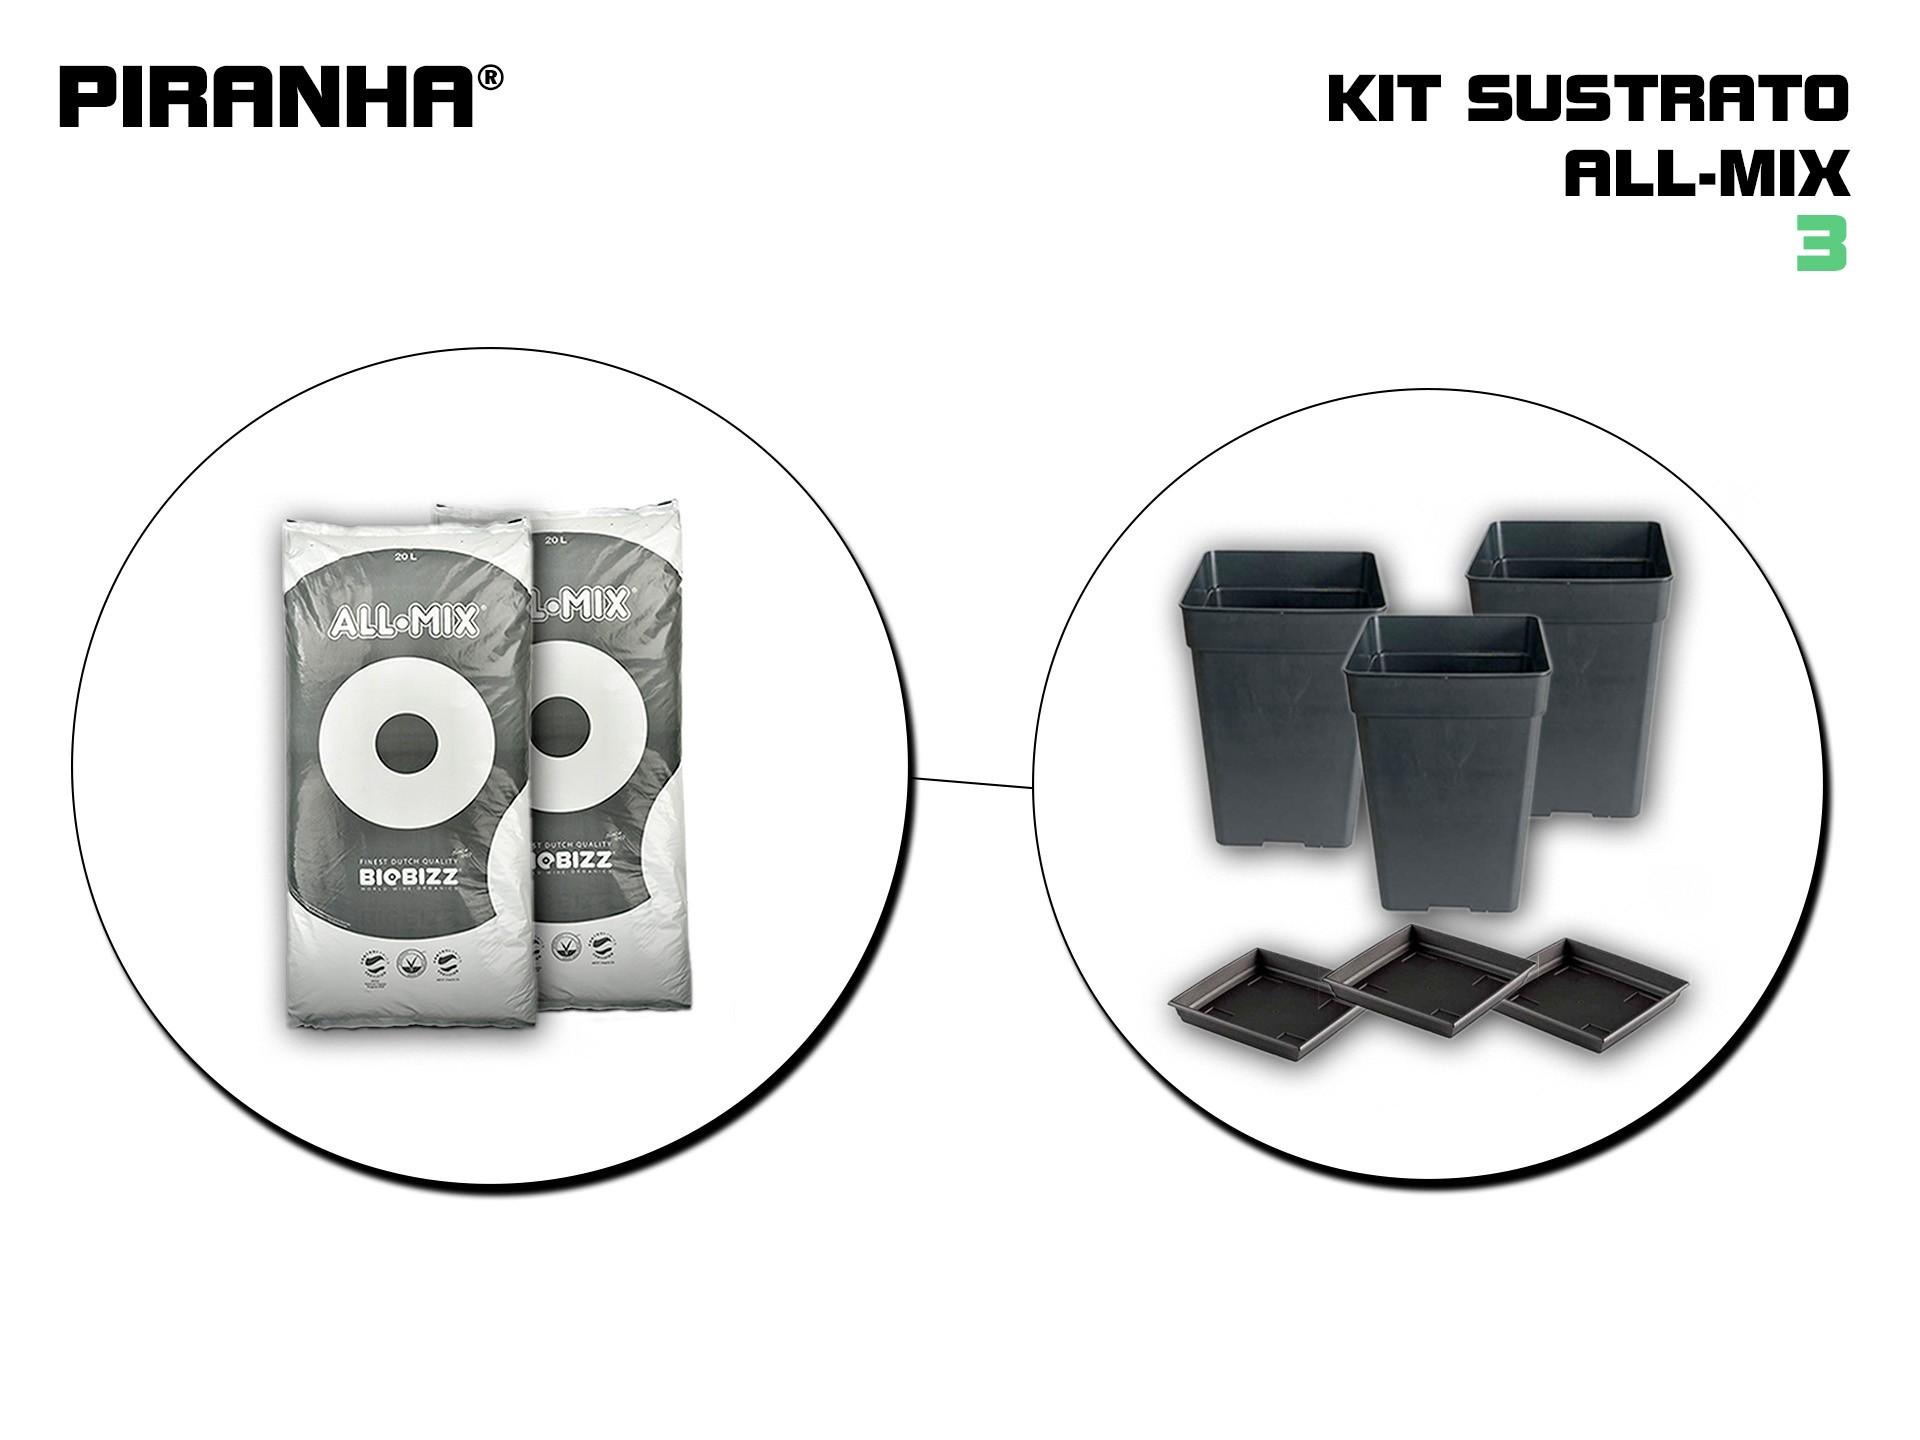 Kit Sustrato 3 All-Mix